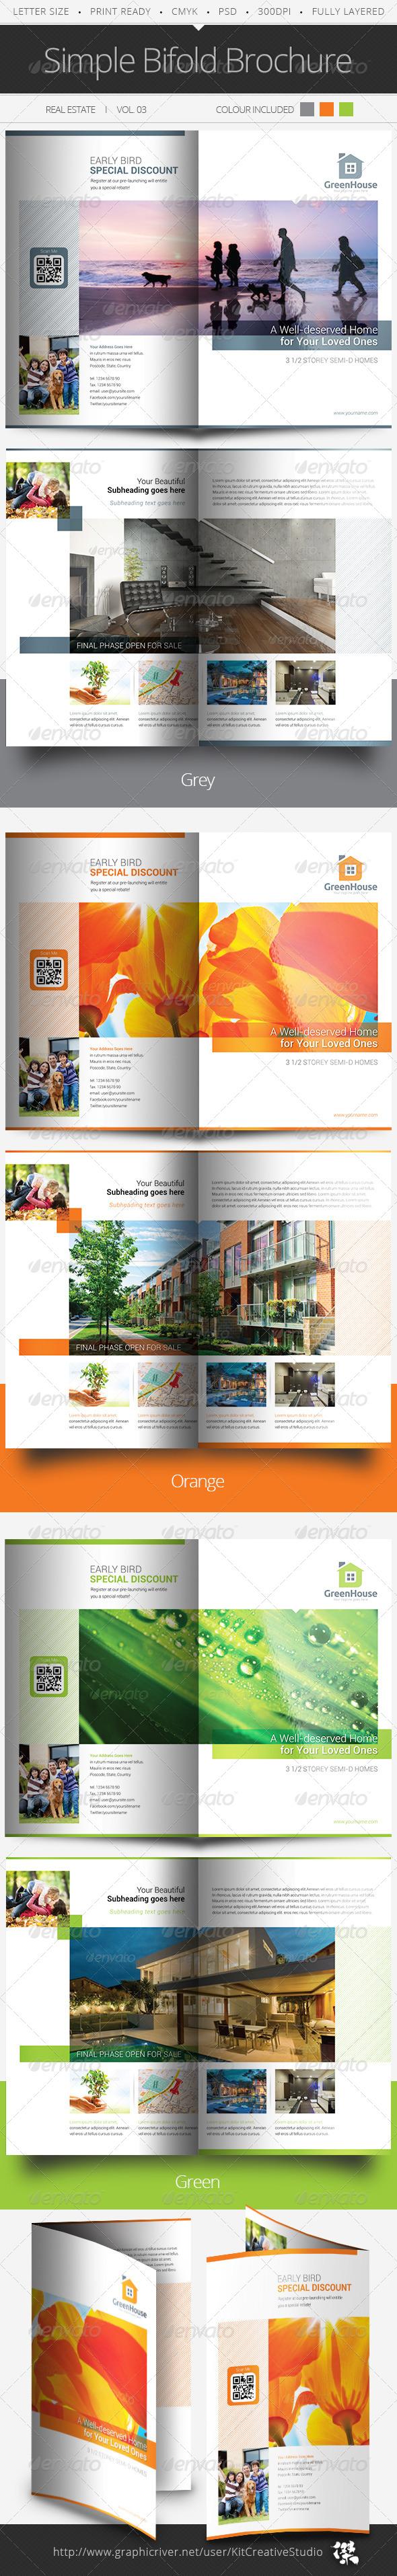 GraphicRiver Simple Bifold Brochure Vol.03 5967042